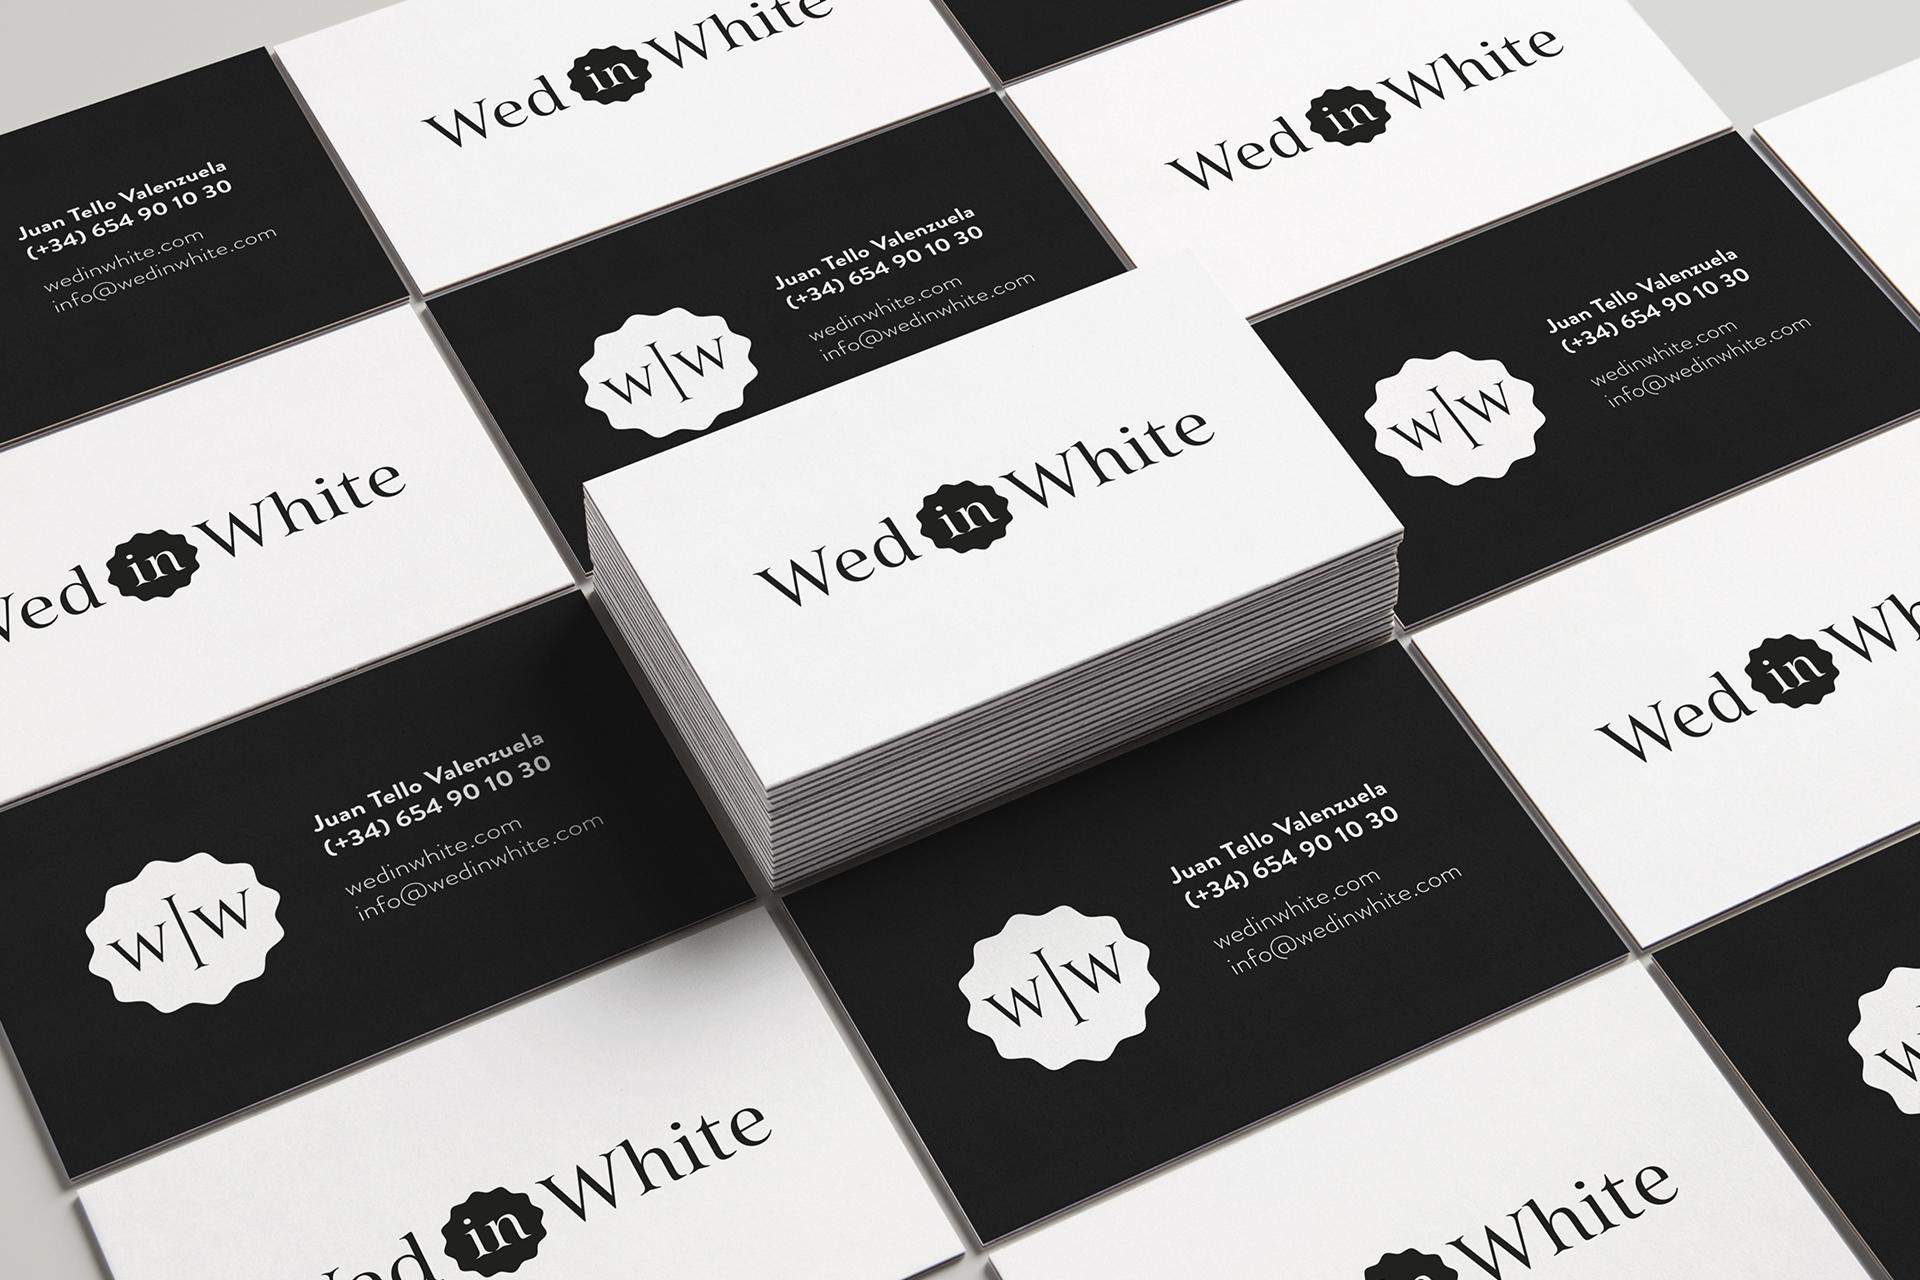 Identidad corporativa WedinWhite - Socioººº